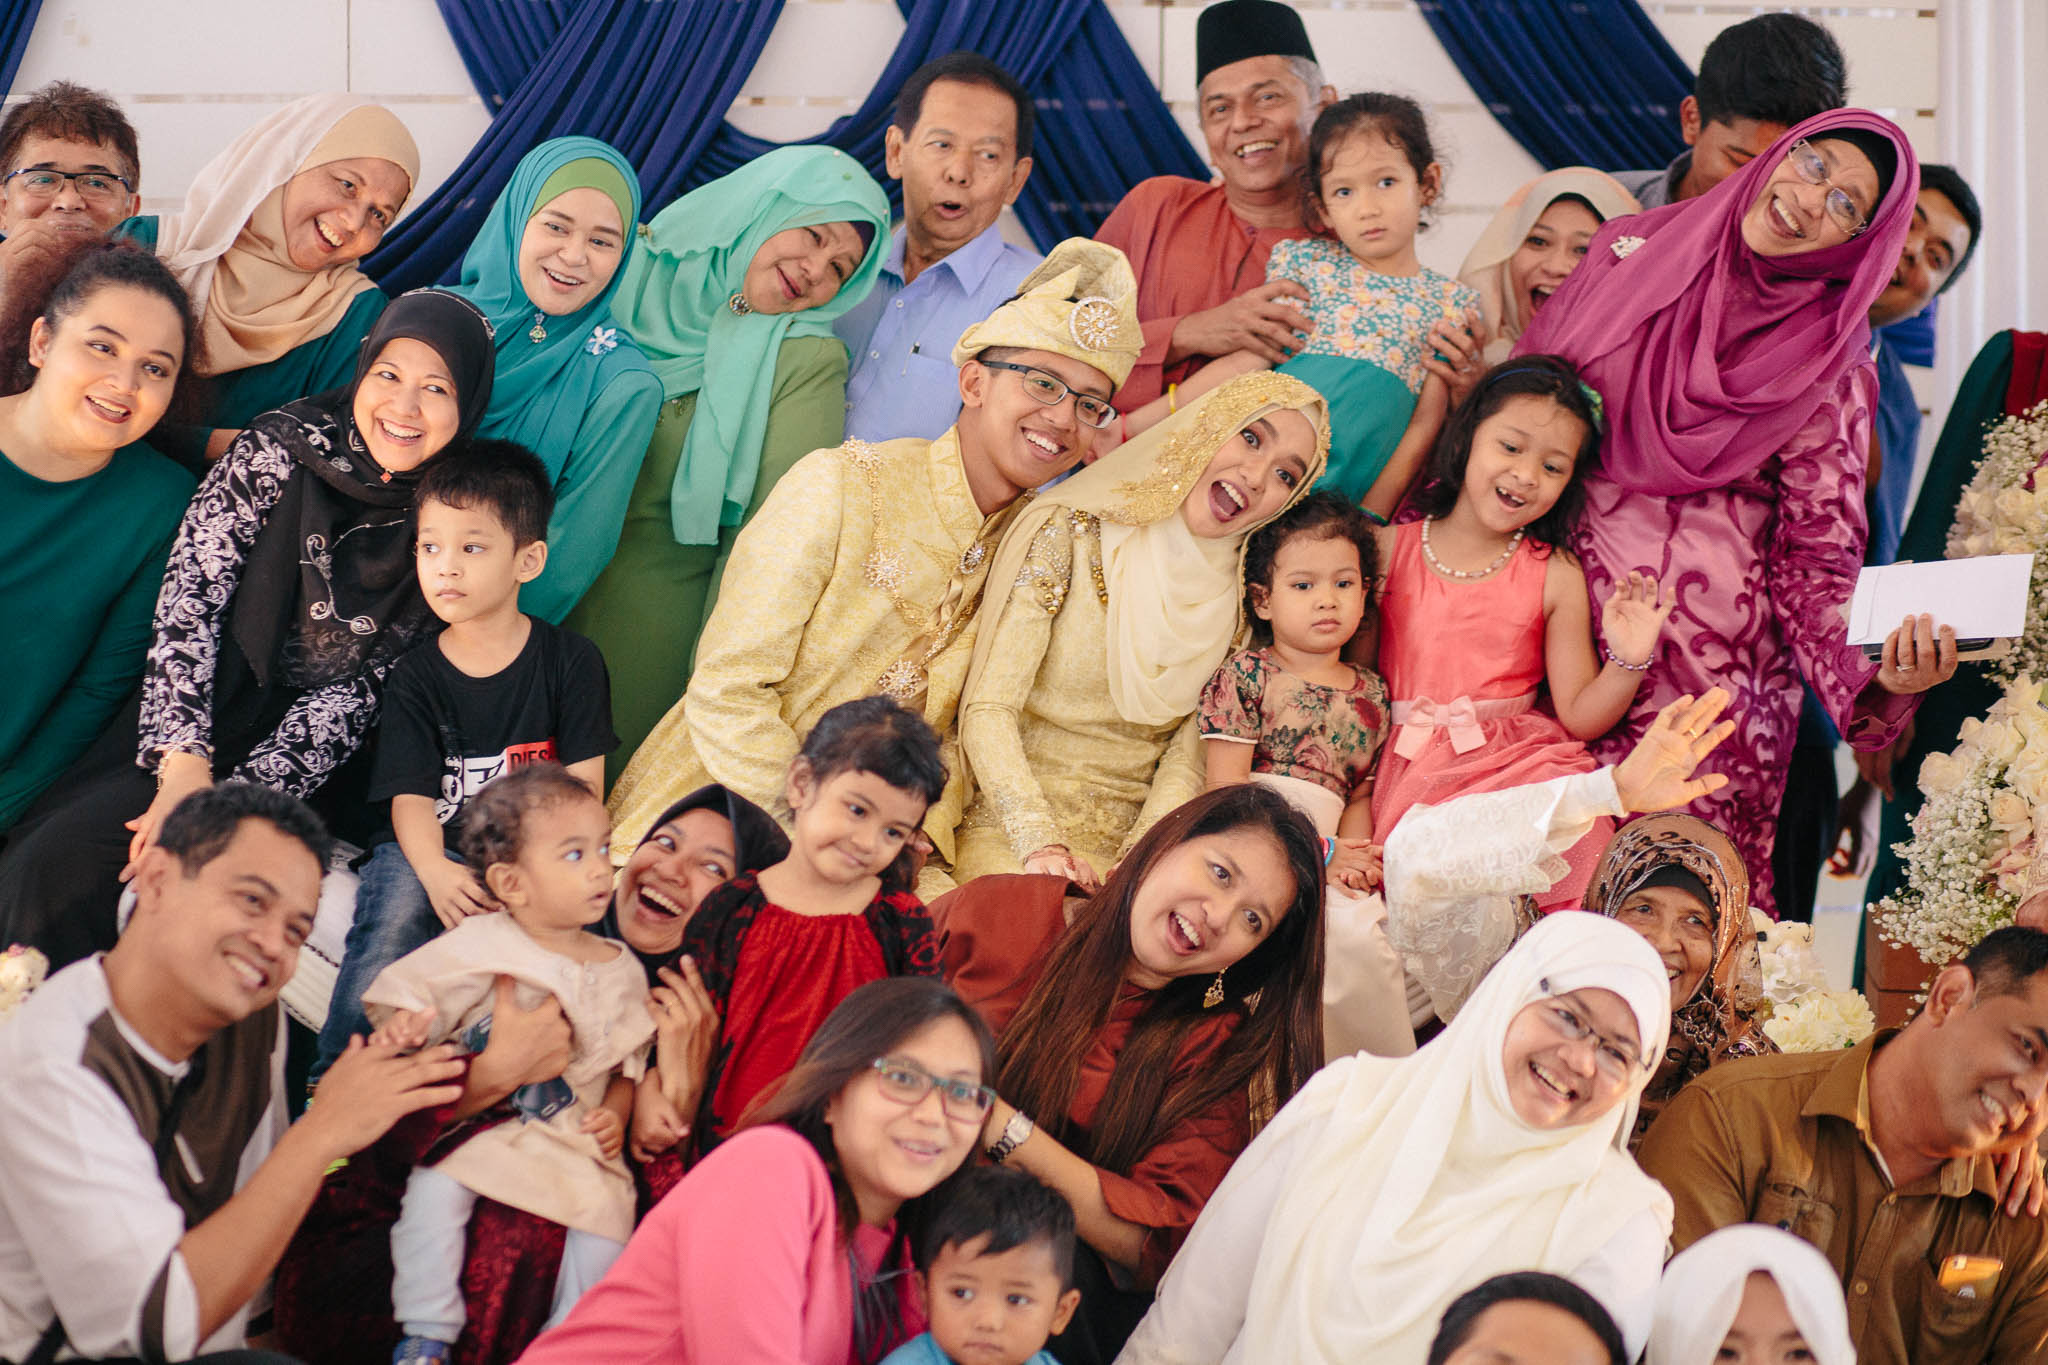 singapore-wedding-photographer-sharalyn-syazwan-049.jpg